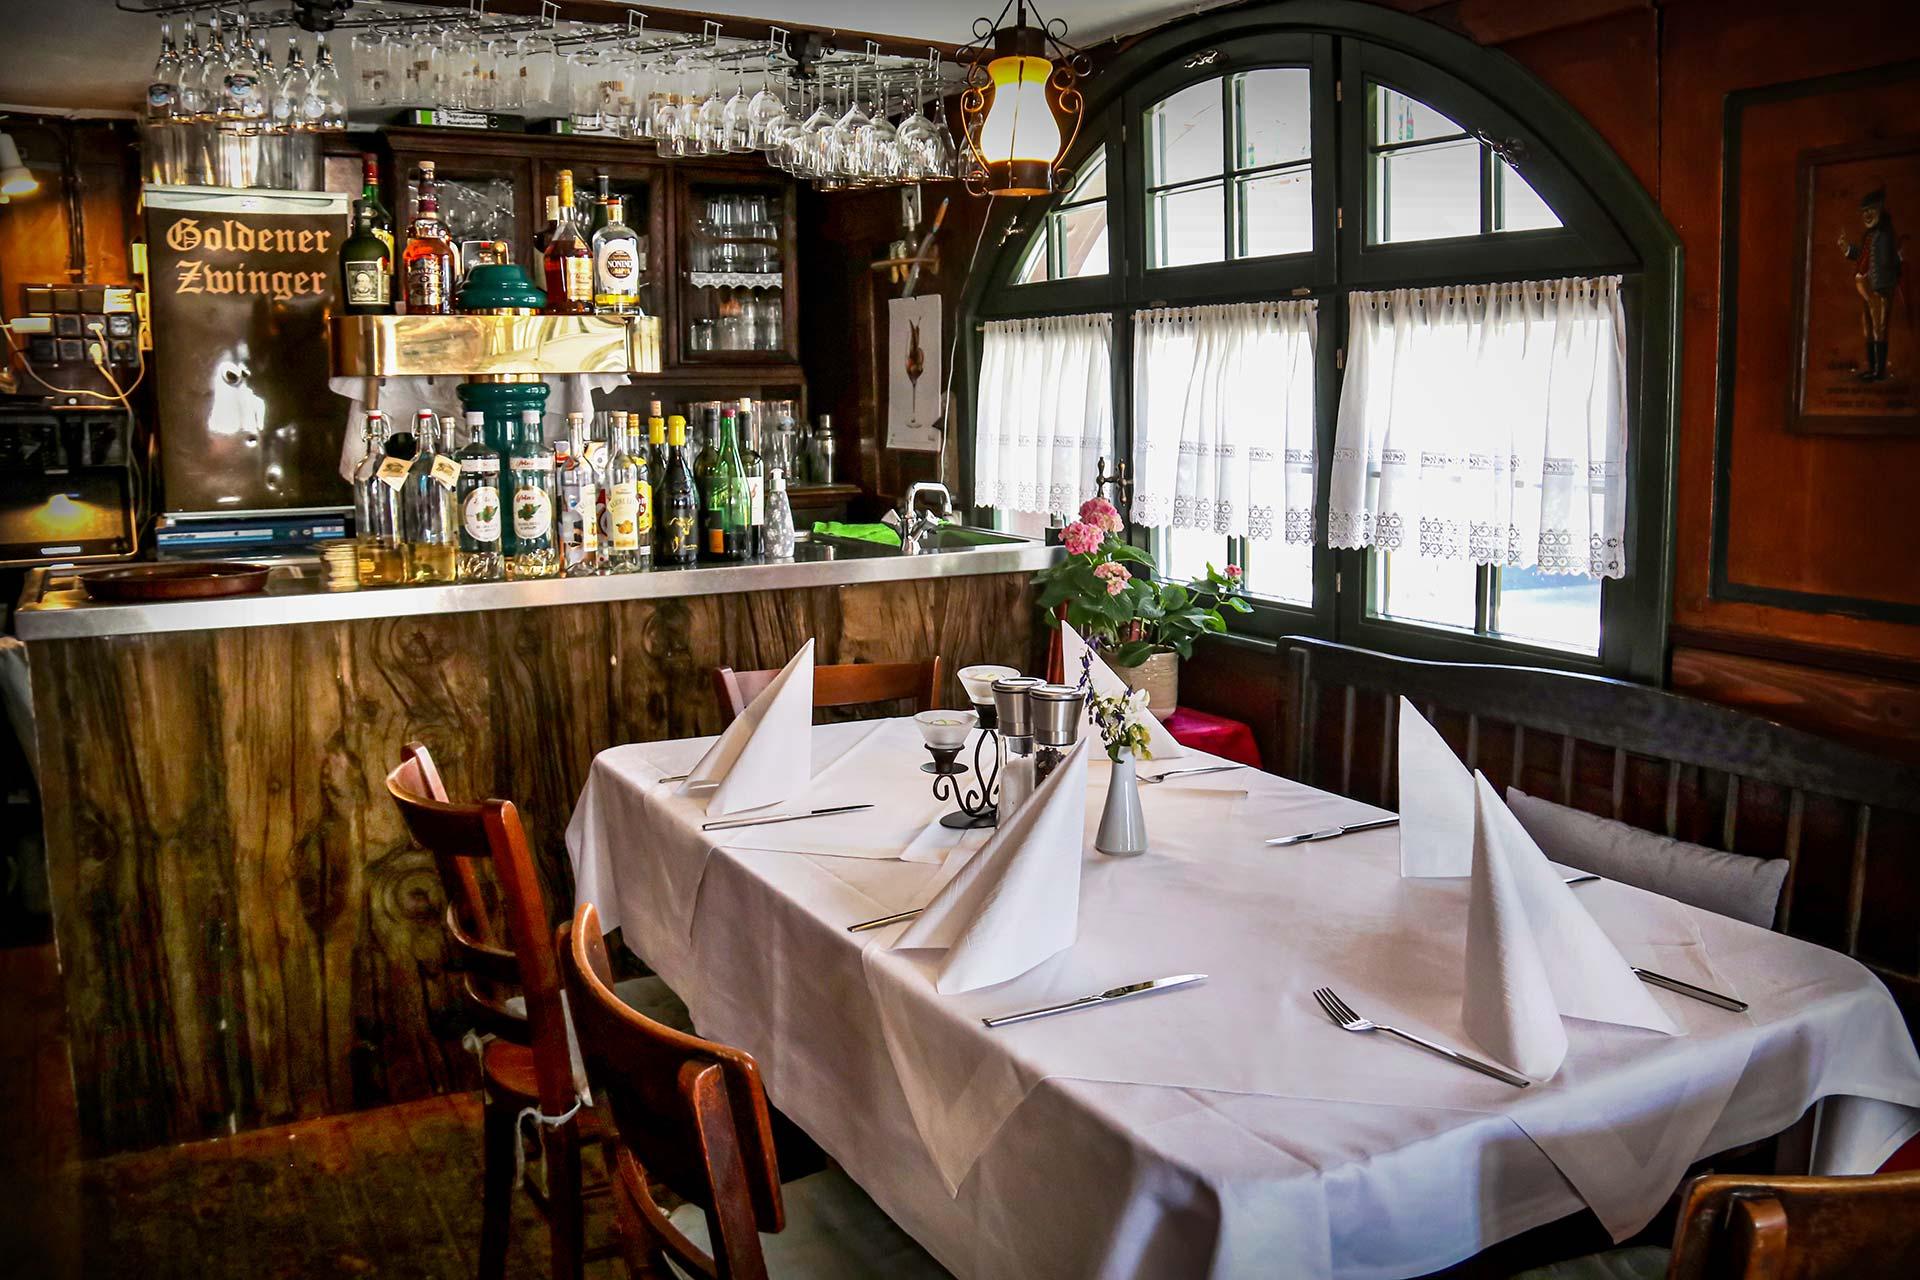 Restaurant - Gastraum & Theke im Restaurant Goldener Zwinger